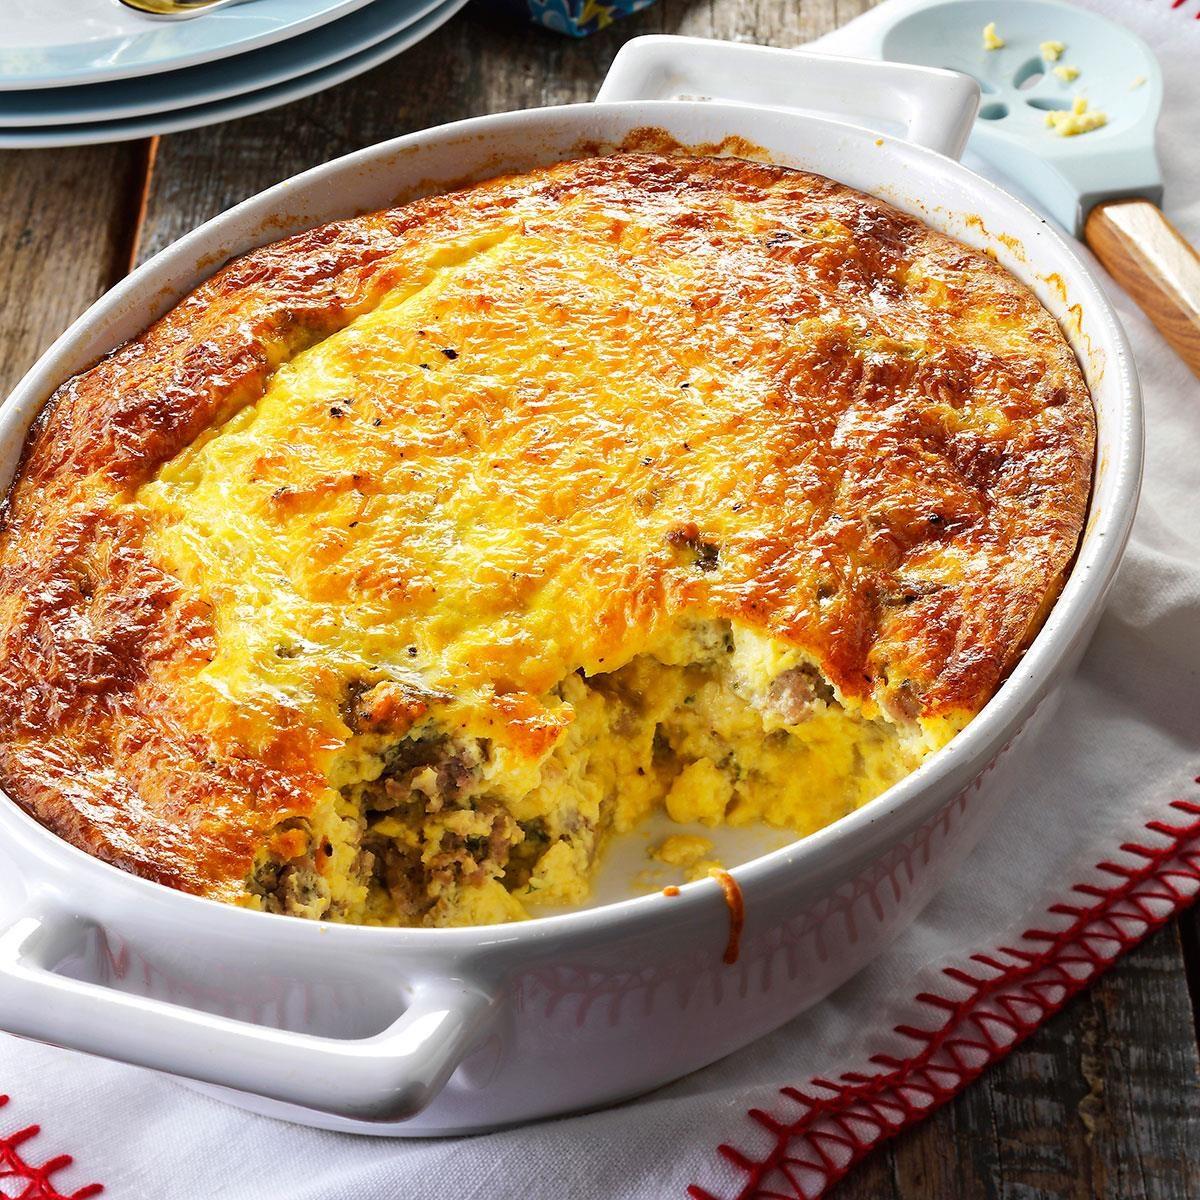 Do Ahead Egg And Sausage Bake: Sausage Egg Bake Recipe